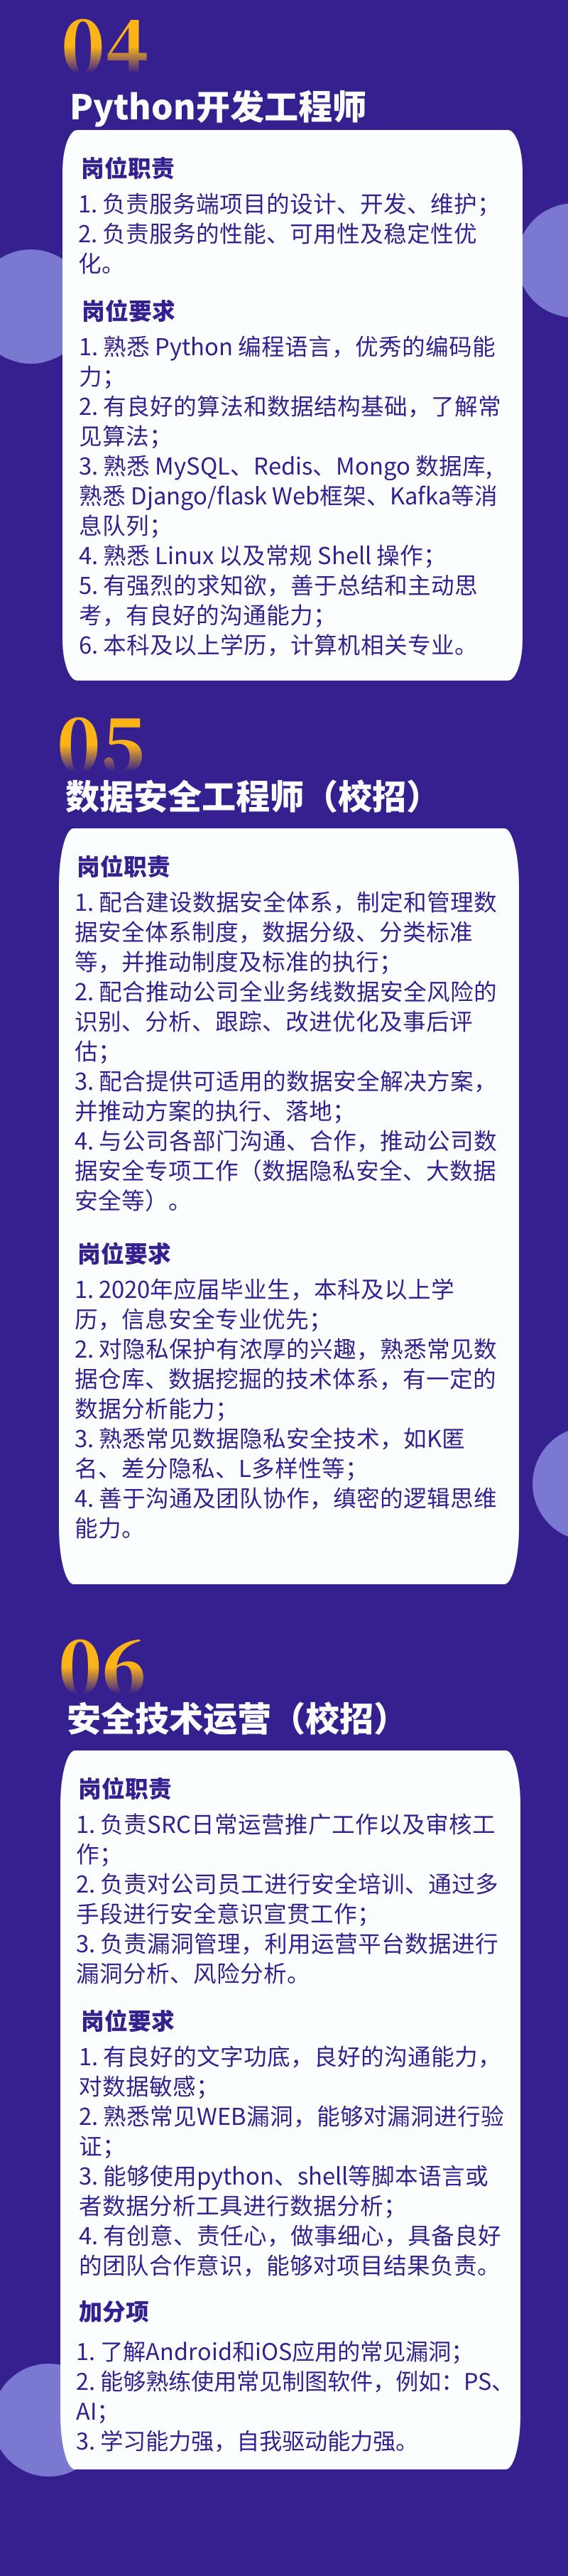 https://momo-mmsrc.oss-cn-hangzhou.aliyuncs.com/img-523531a4-ee12-3ef2-8f43-5e01e5779fd7.png